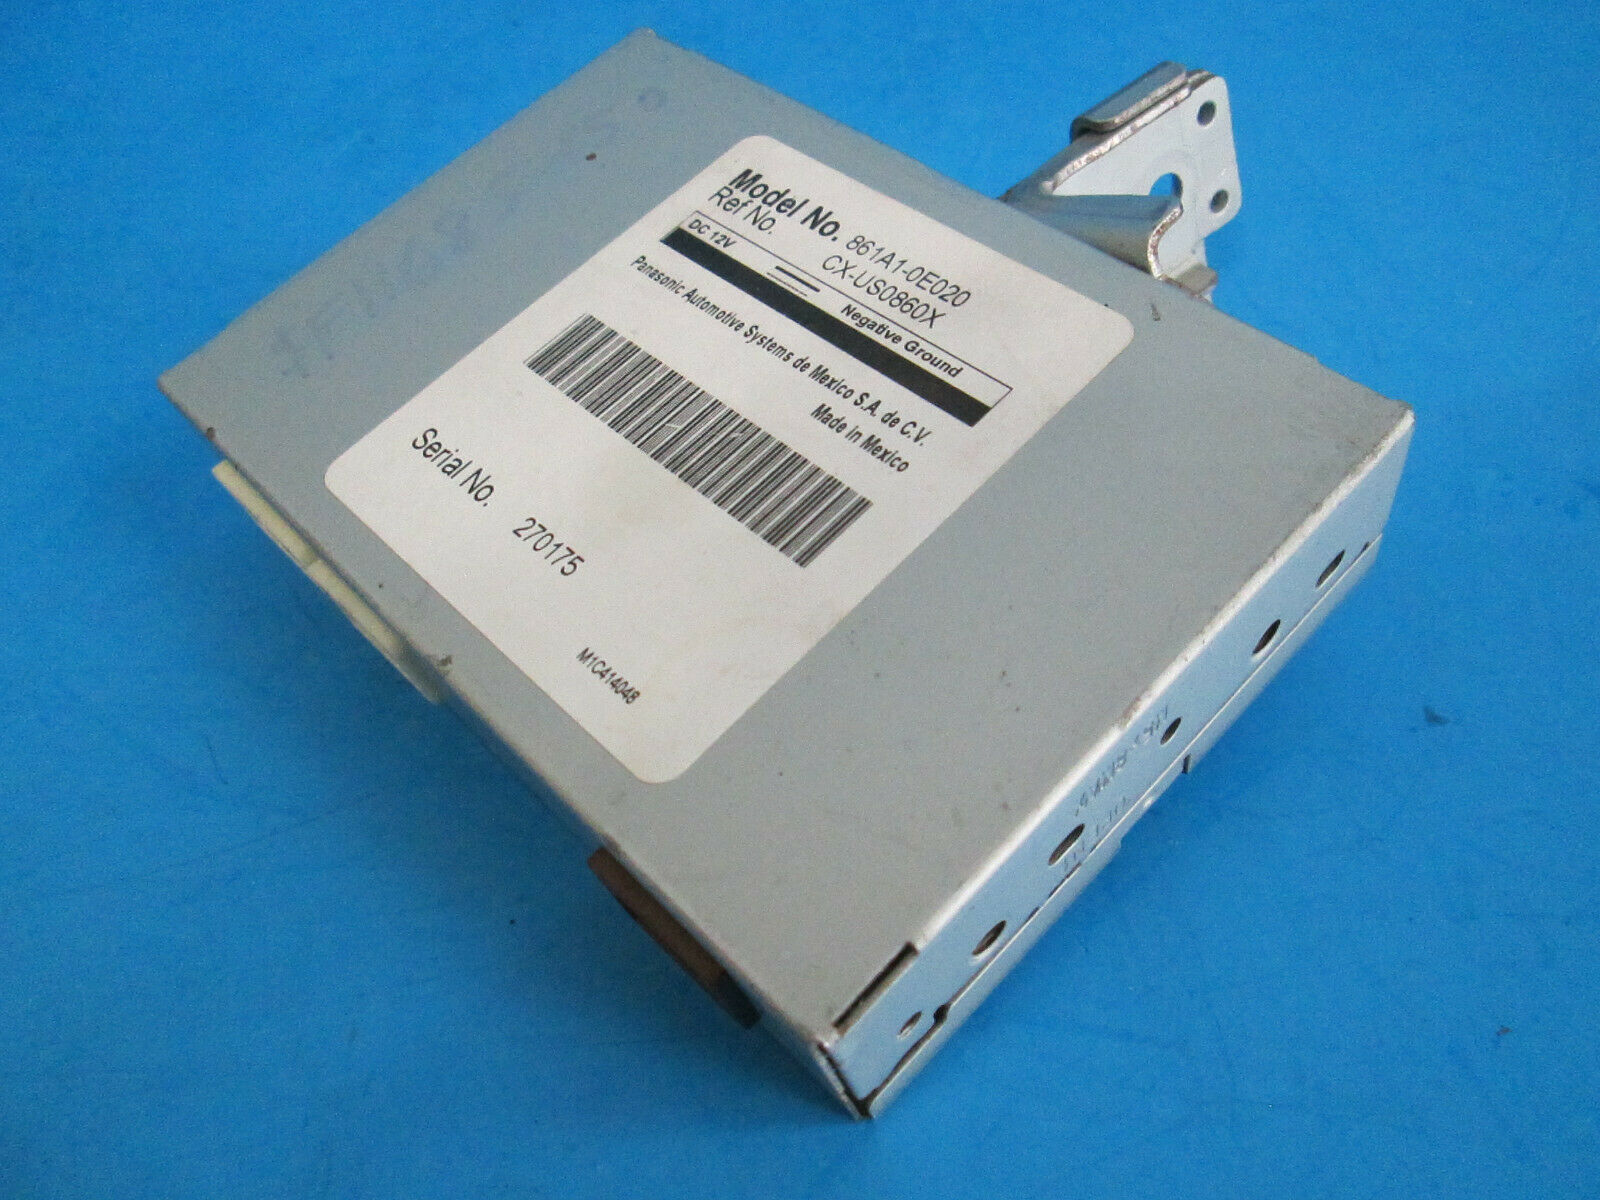 TOYOTA Genuine Accessories 861A1-0E020 USB Engine Control Unit